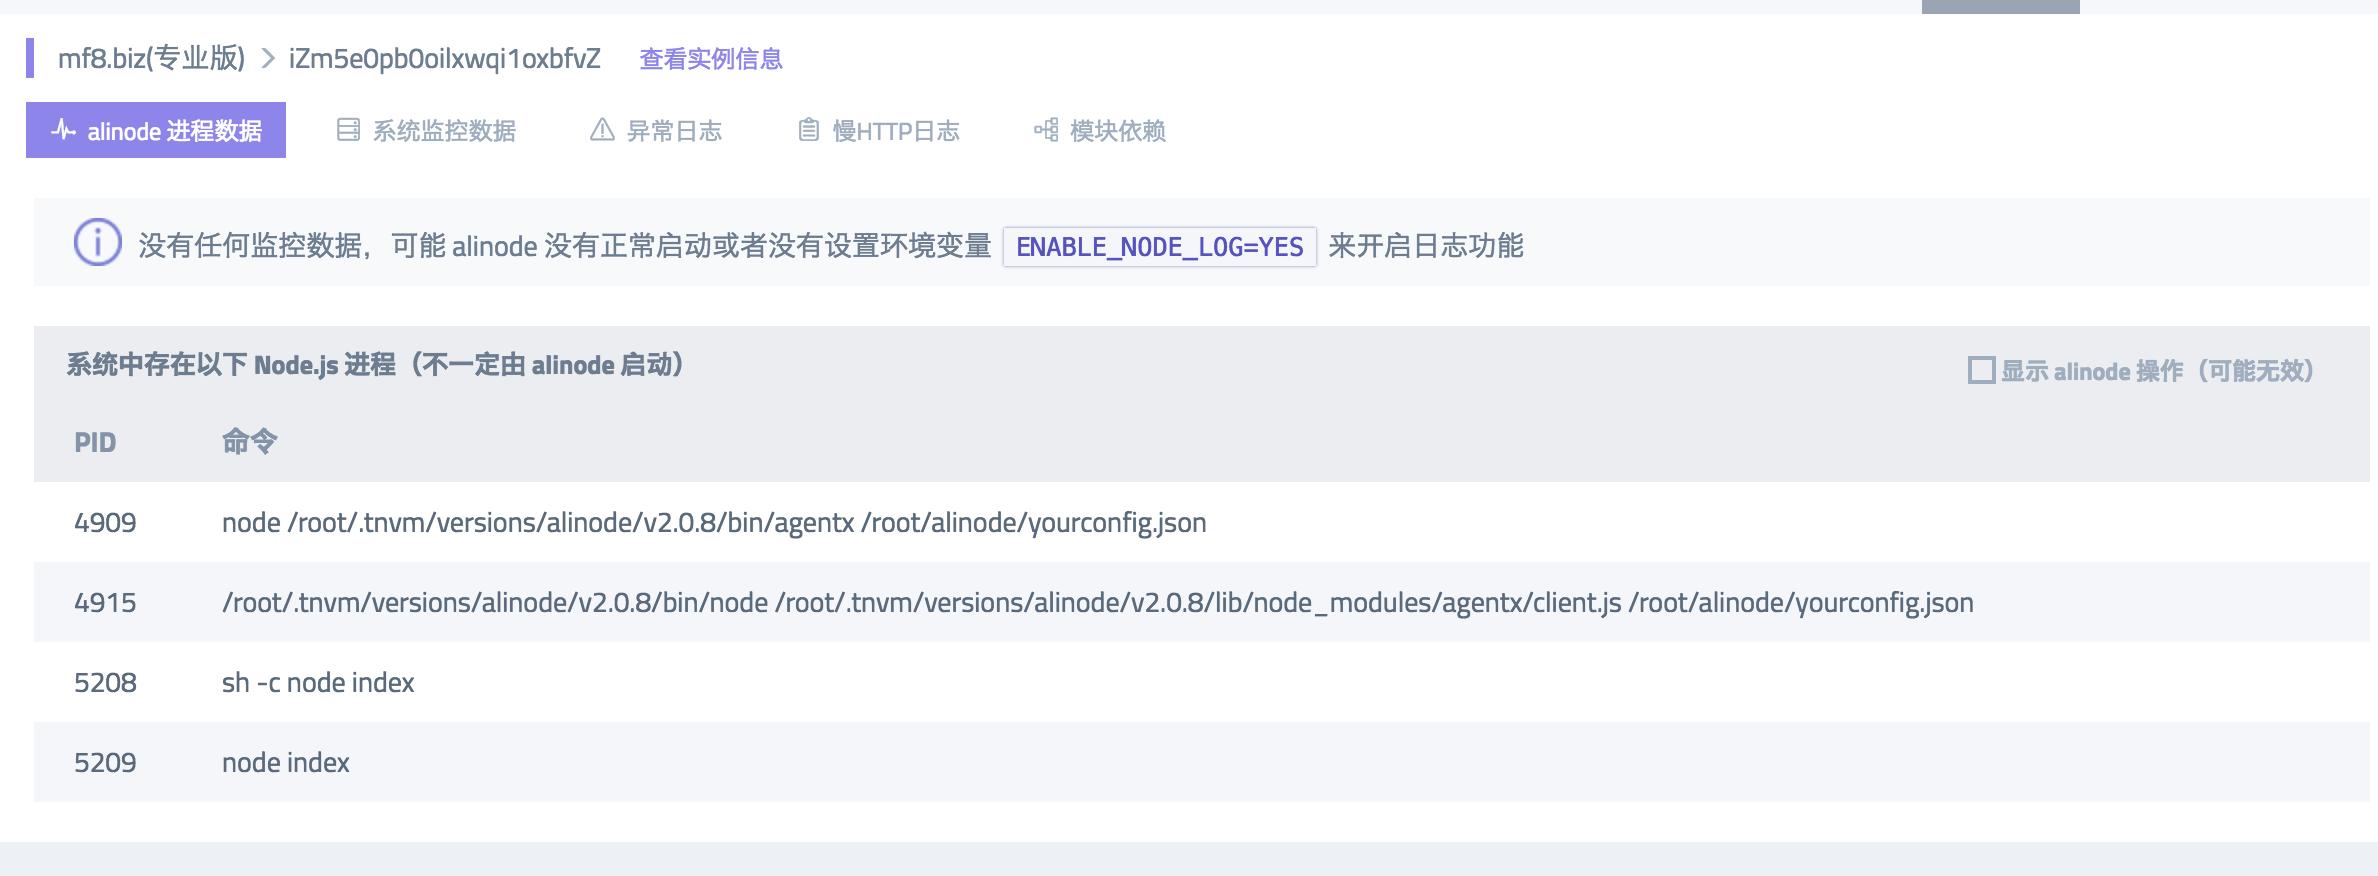 Alinode 阿里云出品的 Node.js 解决方案体验-米饭粑